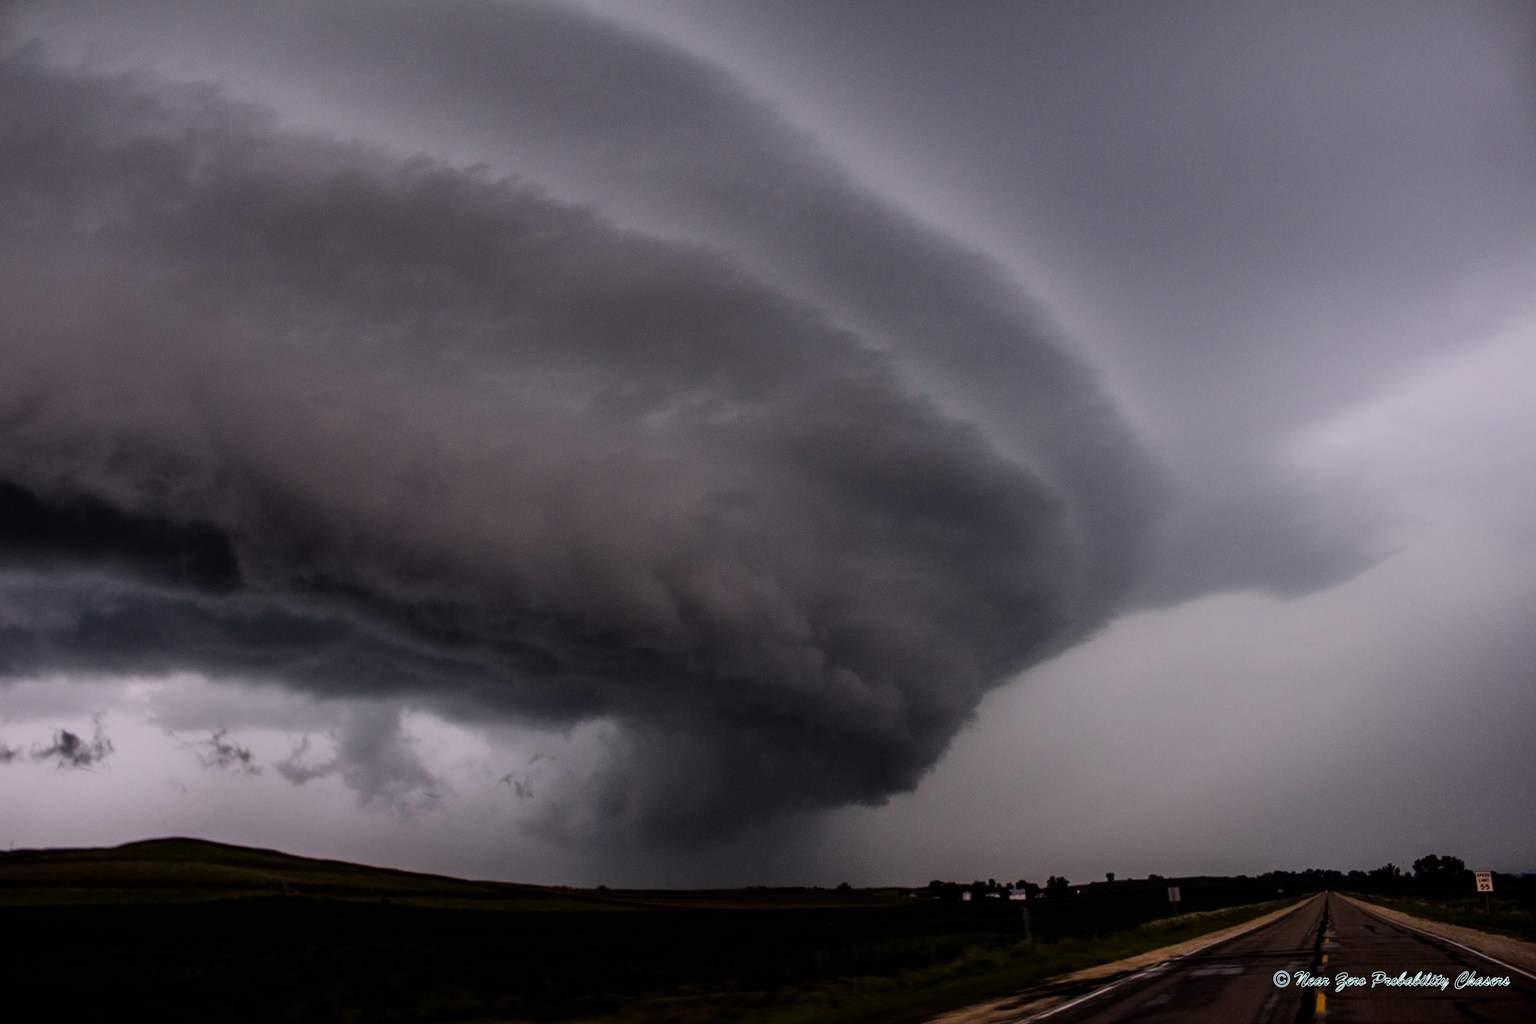 August 22nd in Iowa: very photogenic storm!